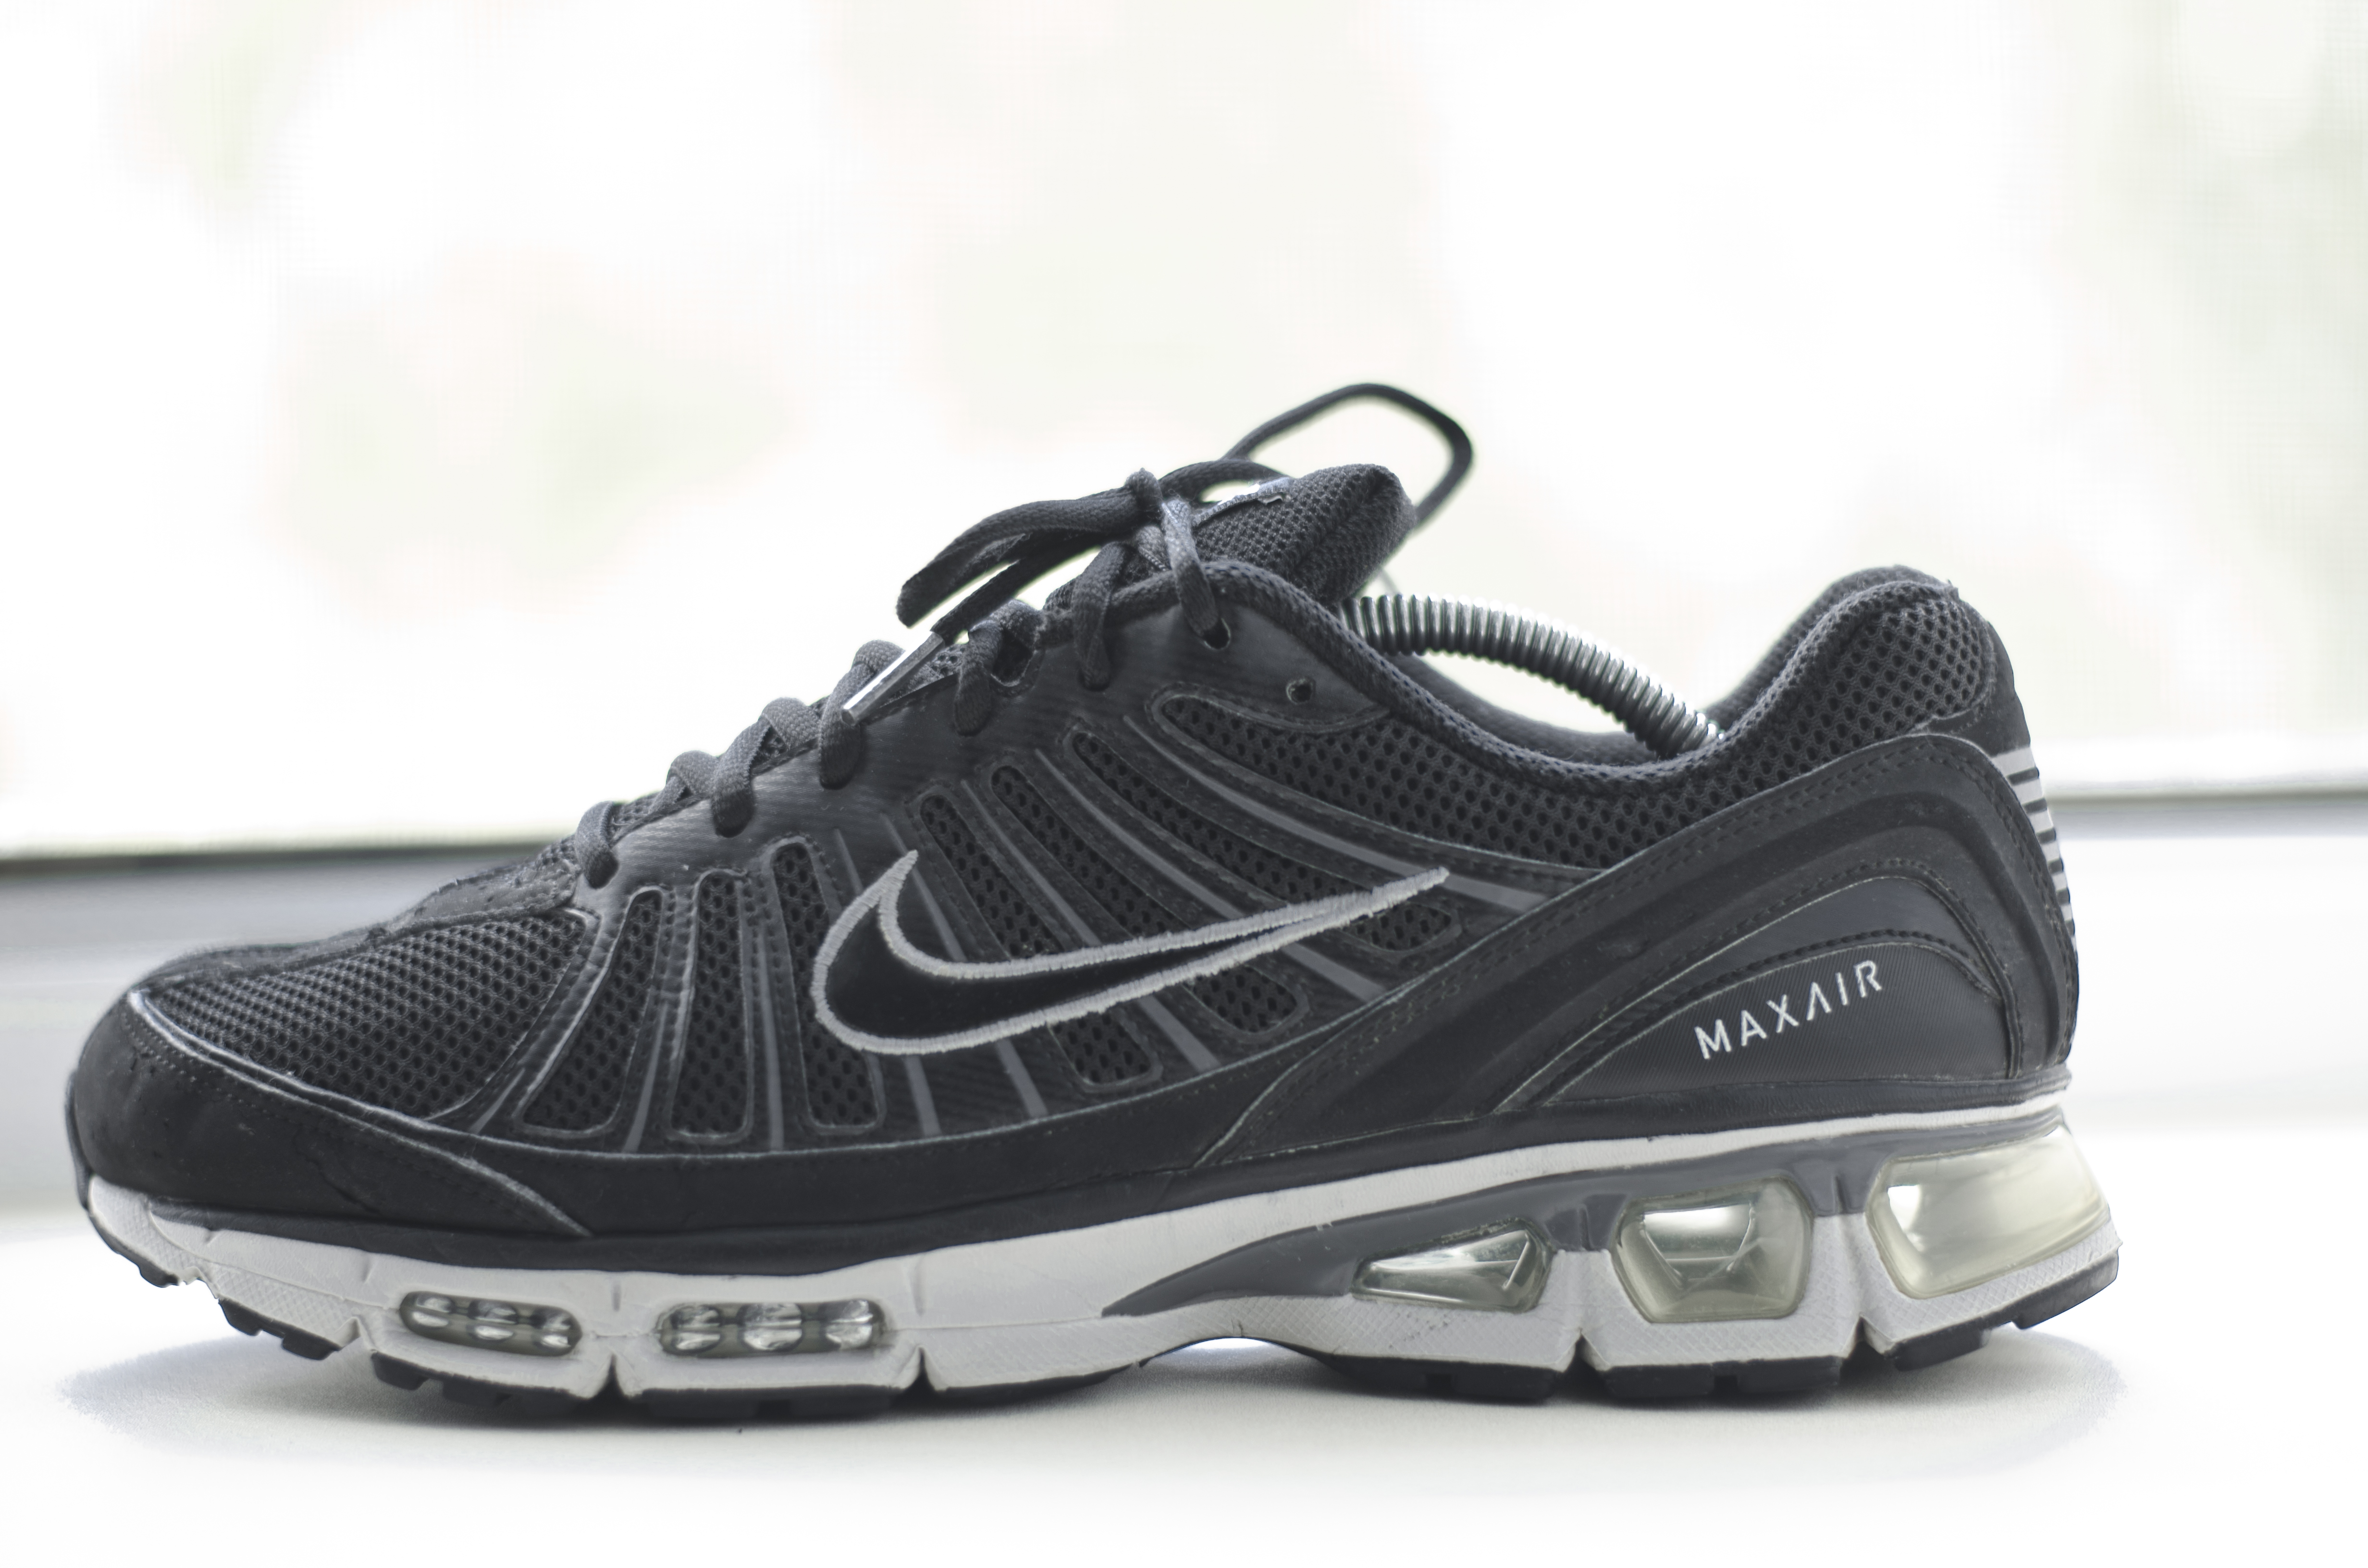 6c9d03f86e Nike × Street Wear ×. [OPEN TO OFFERS] RARE Nike Air Max Tailwind 2009 not  adidas reebok asics ...